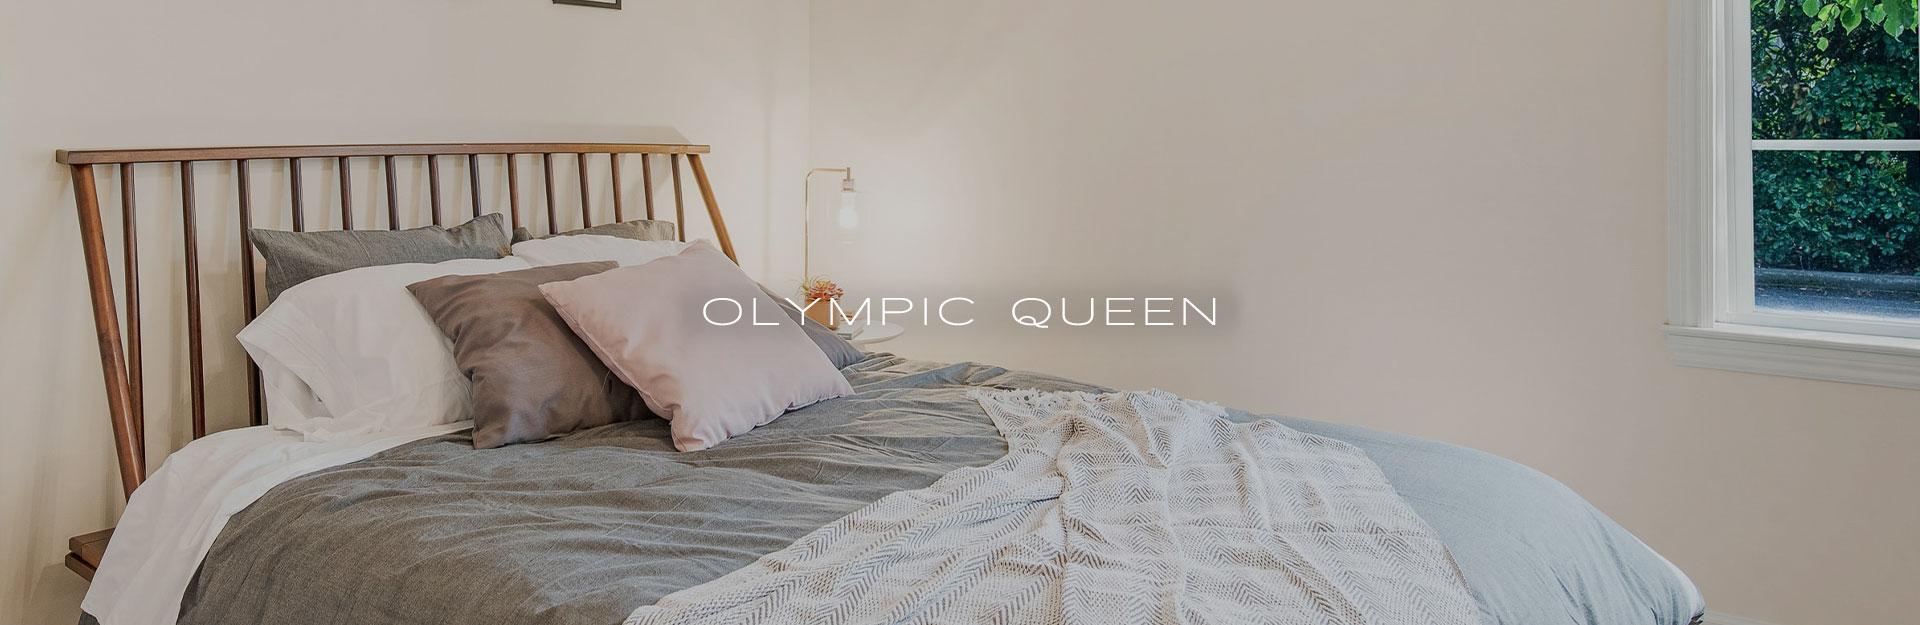 abh-olympicqueensheets.jpg